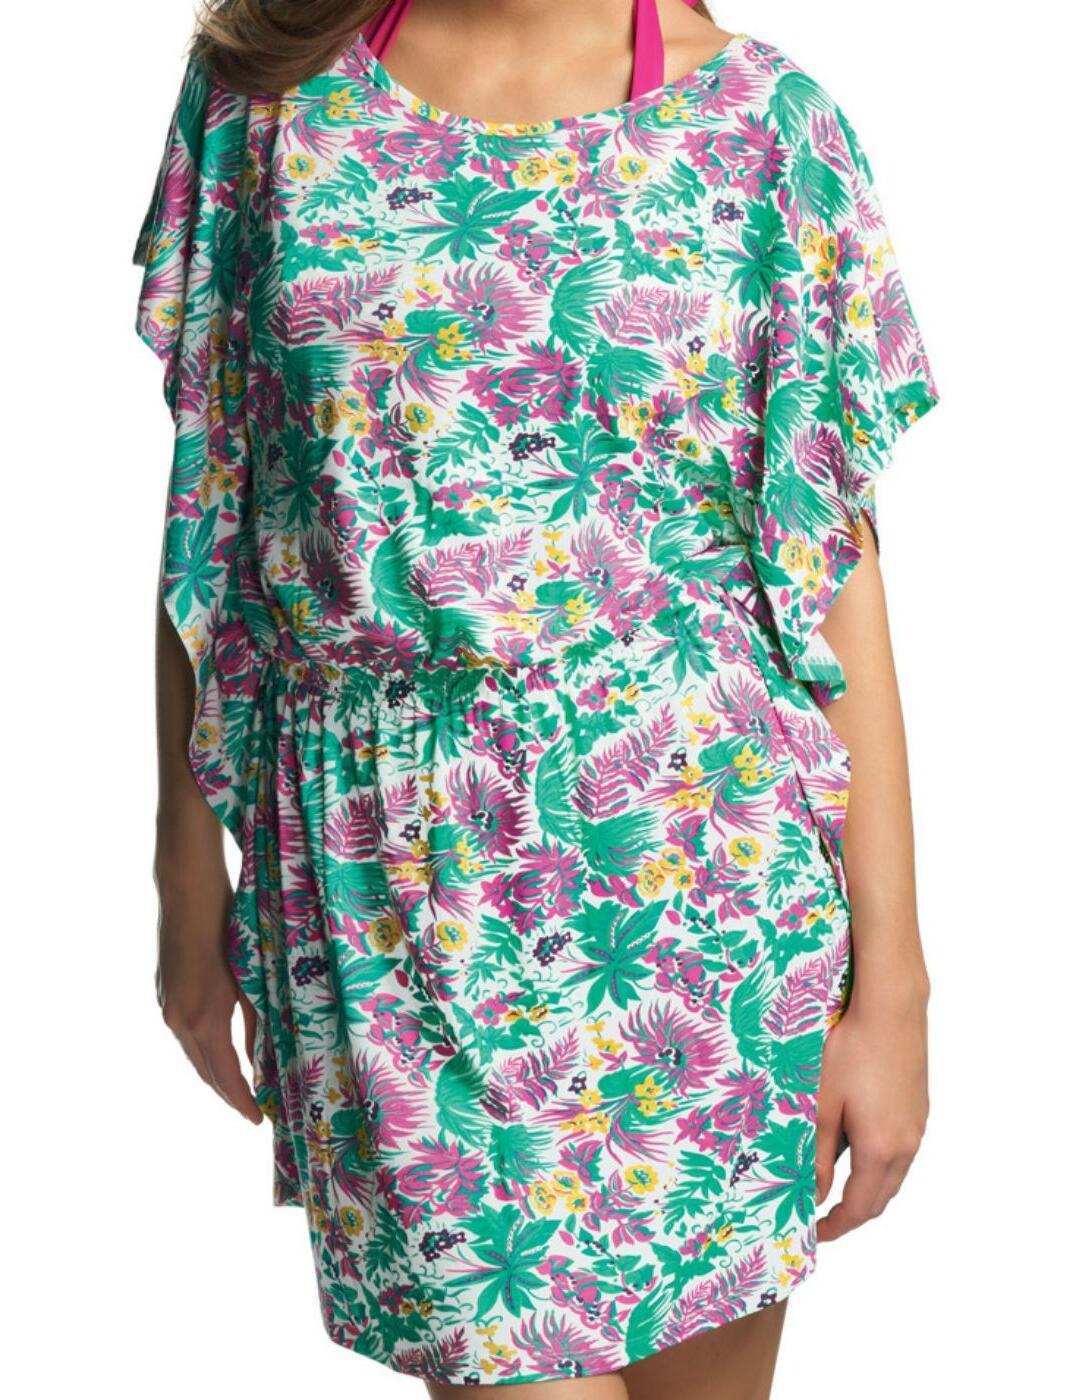 3617 Freya Girl Friday Tunic Beach Dress - 3167 Jade